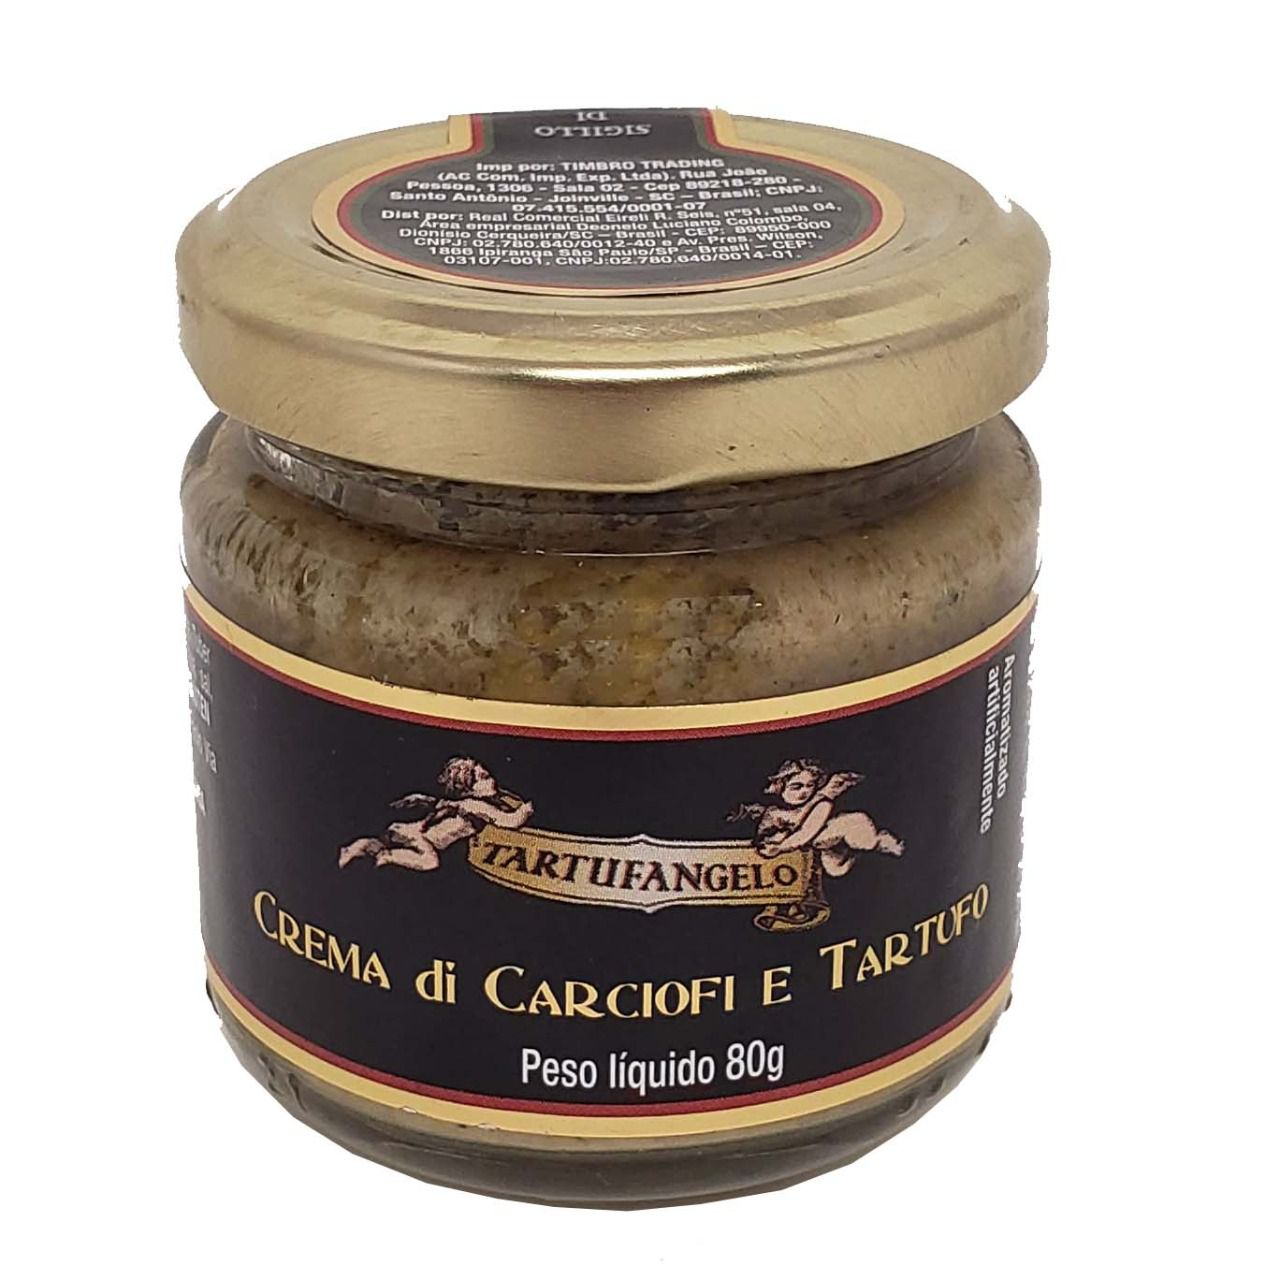 Crema di Carciofi e Tartufo - 80g -